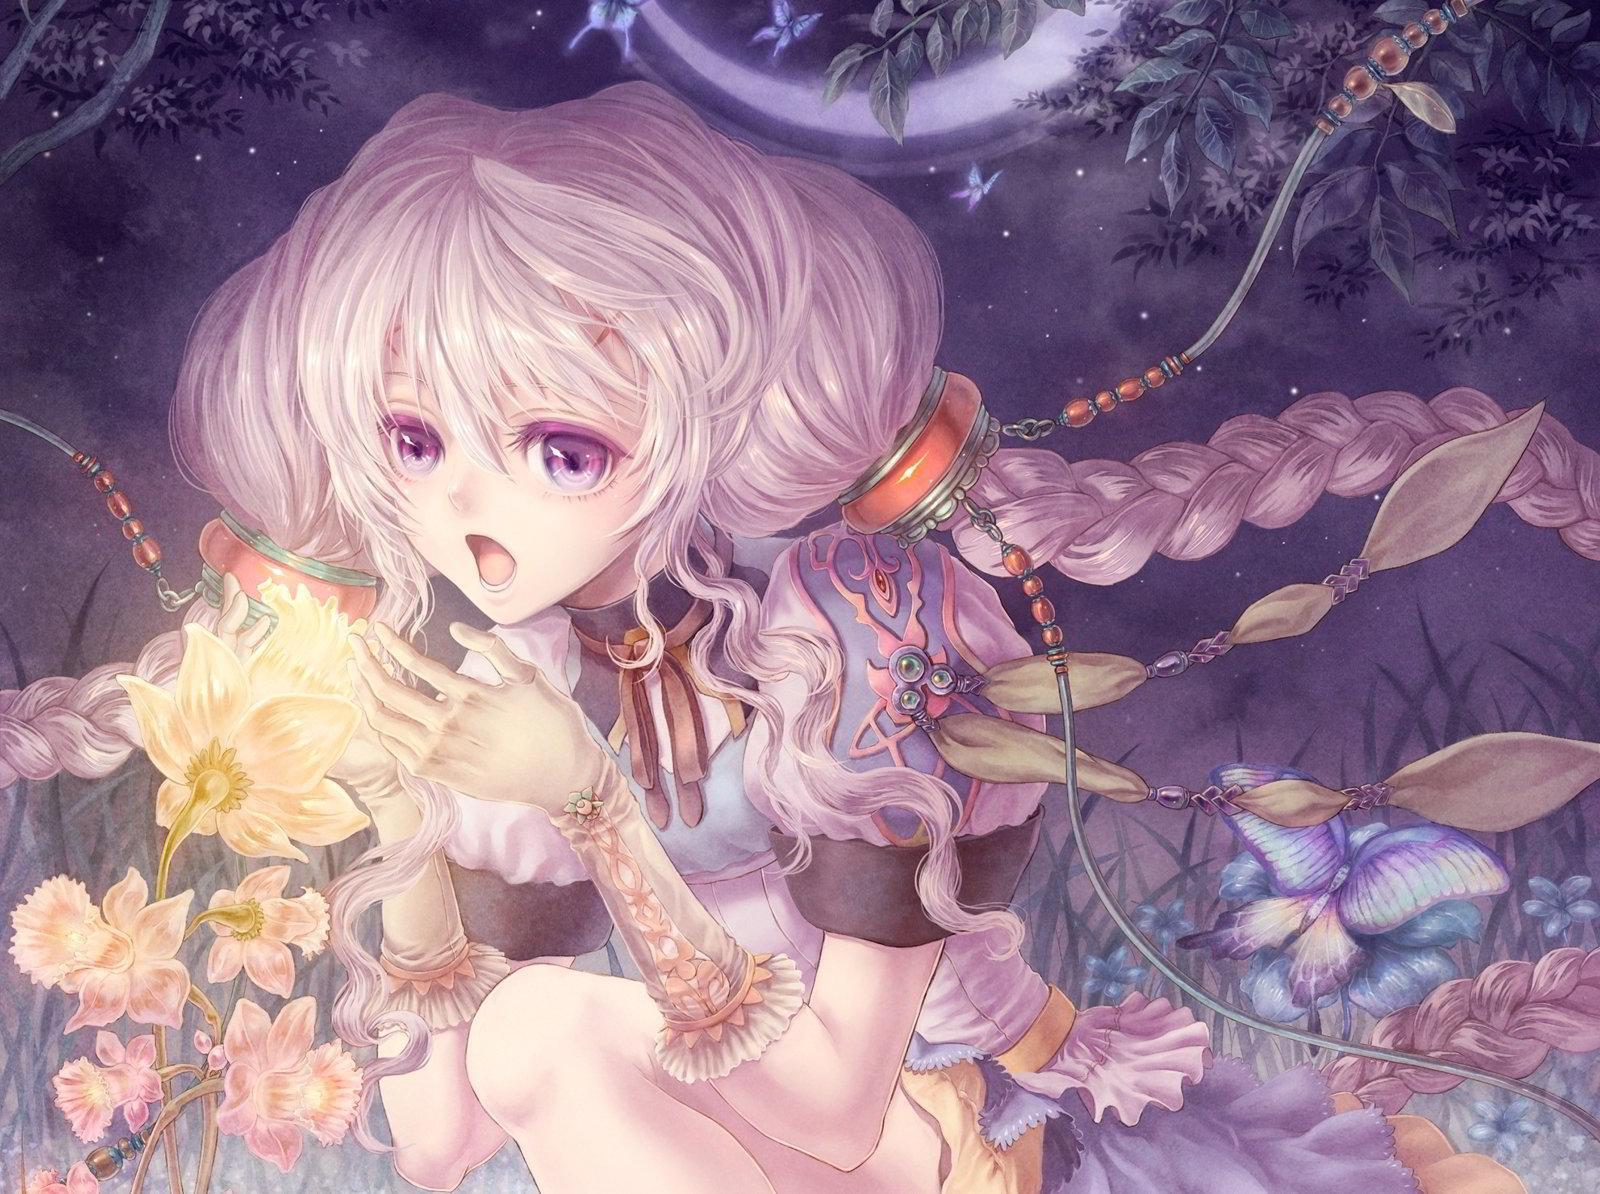 hinh nen anime girl dang yeu 7